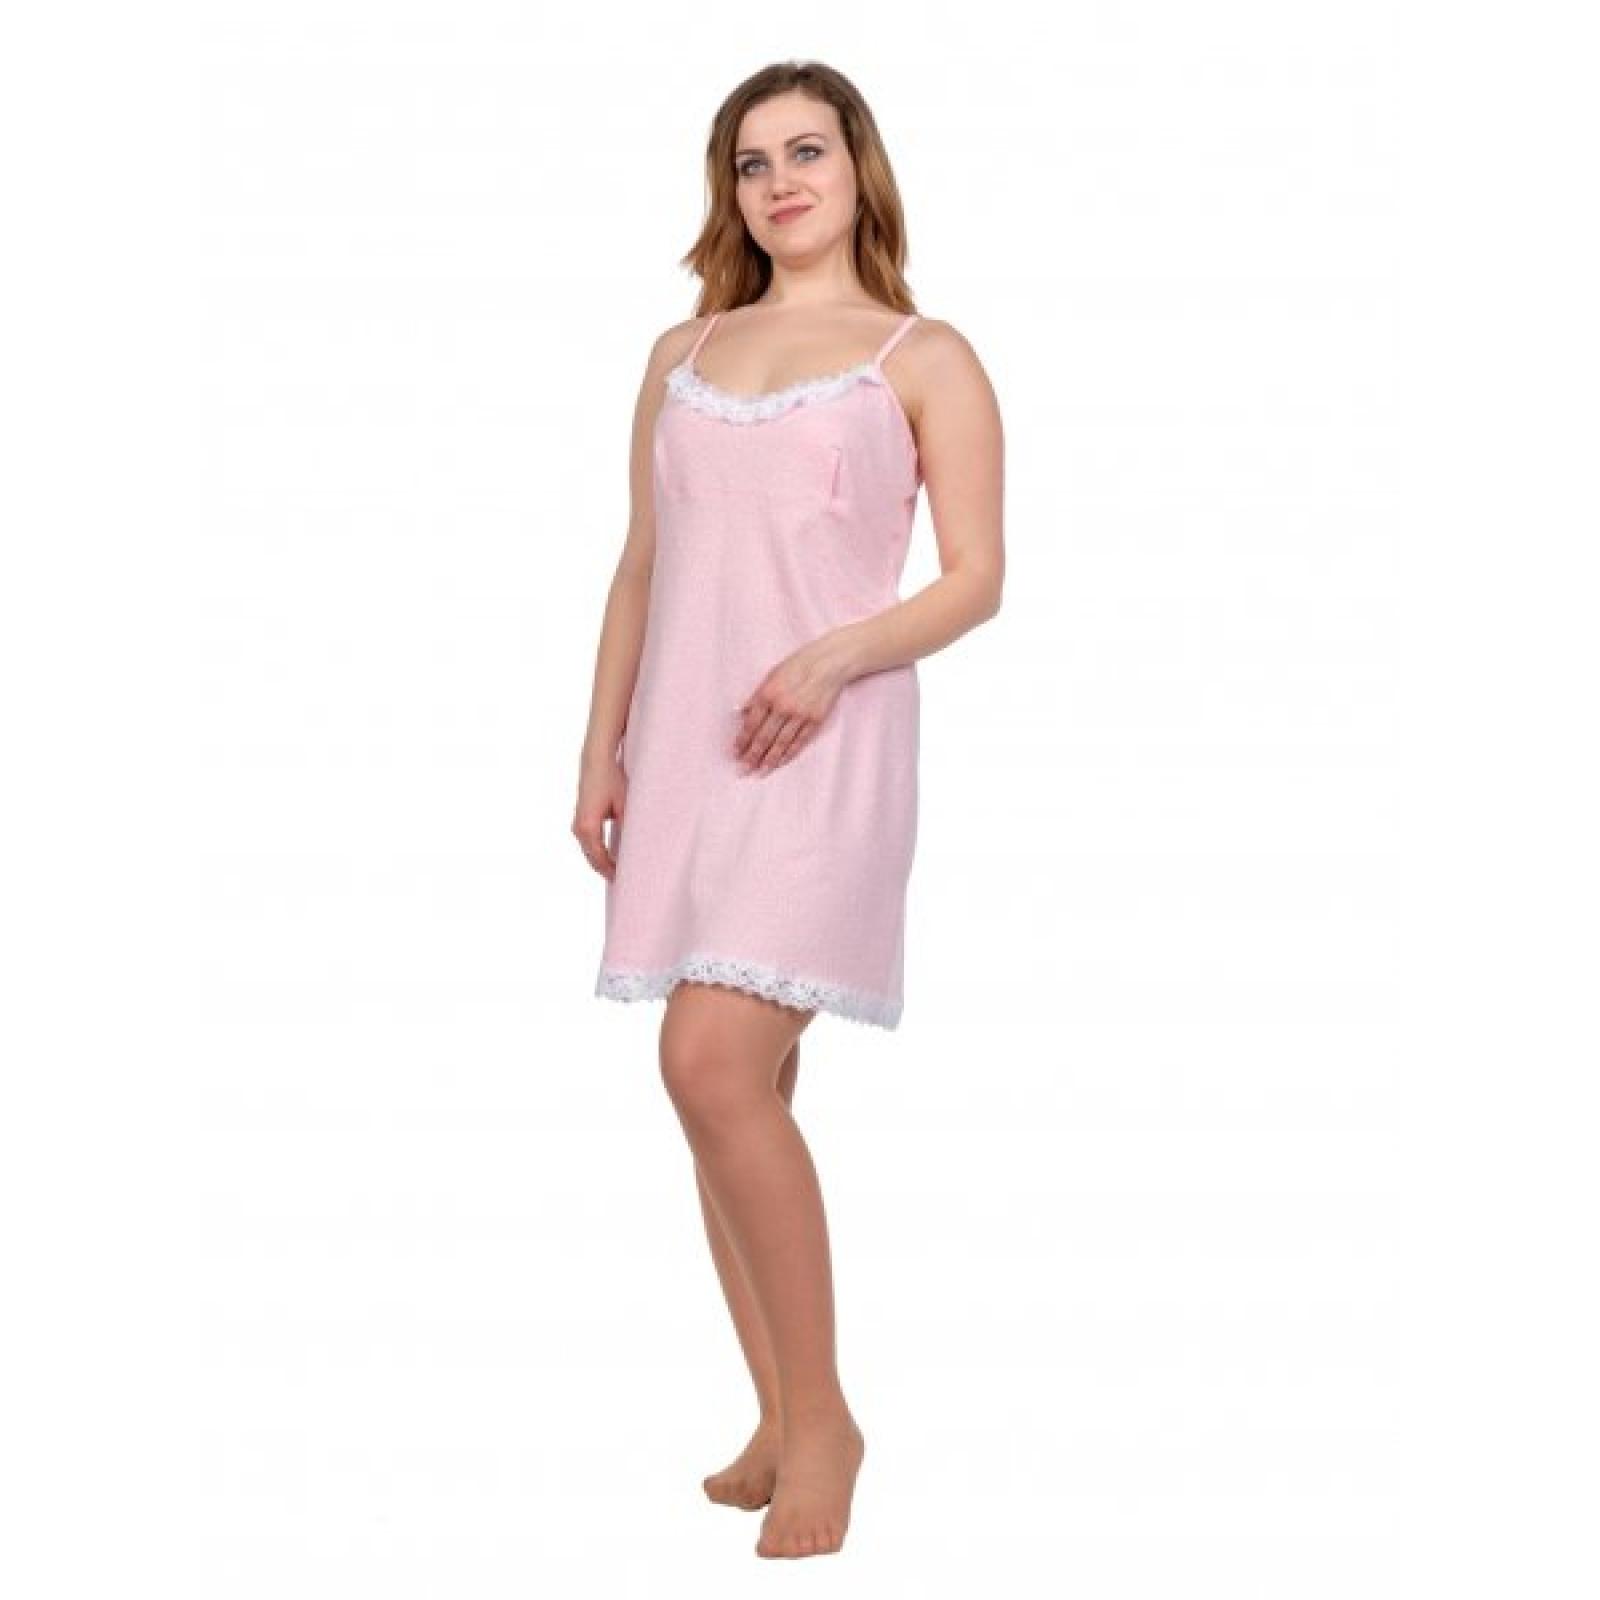 Сорочка на лямках (бледно-розовая с рисунком) М-0005Р